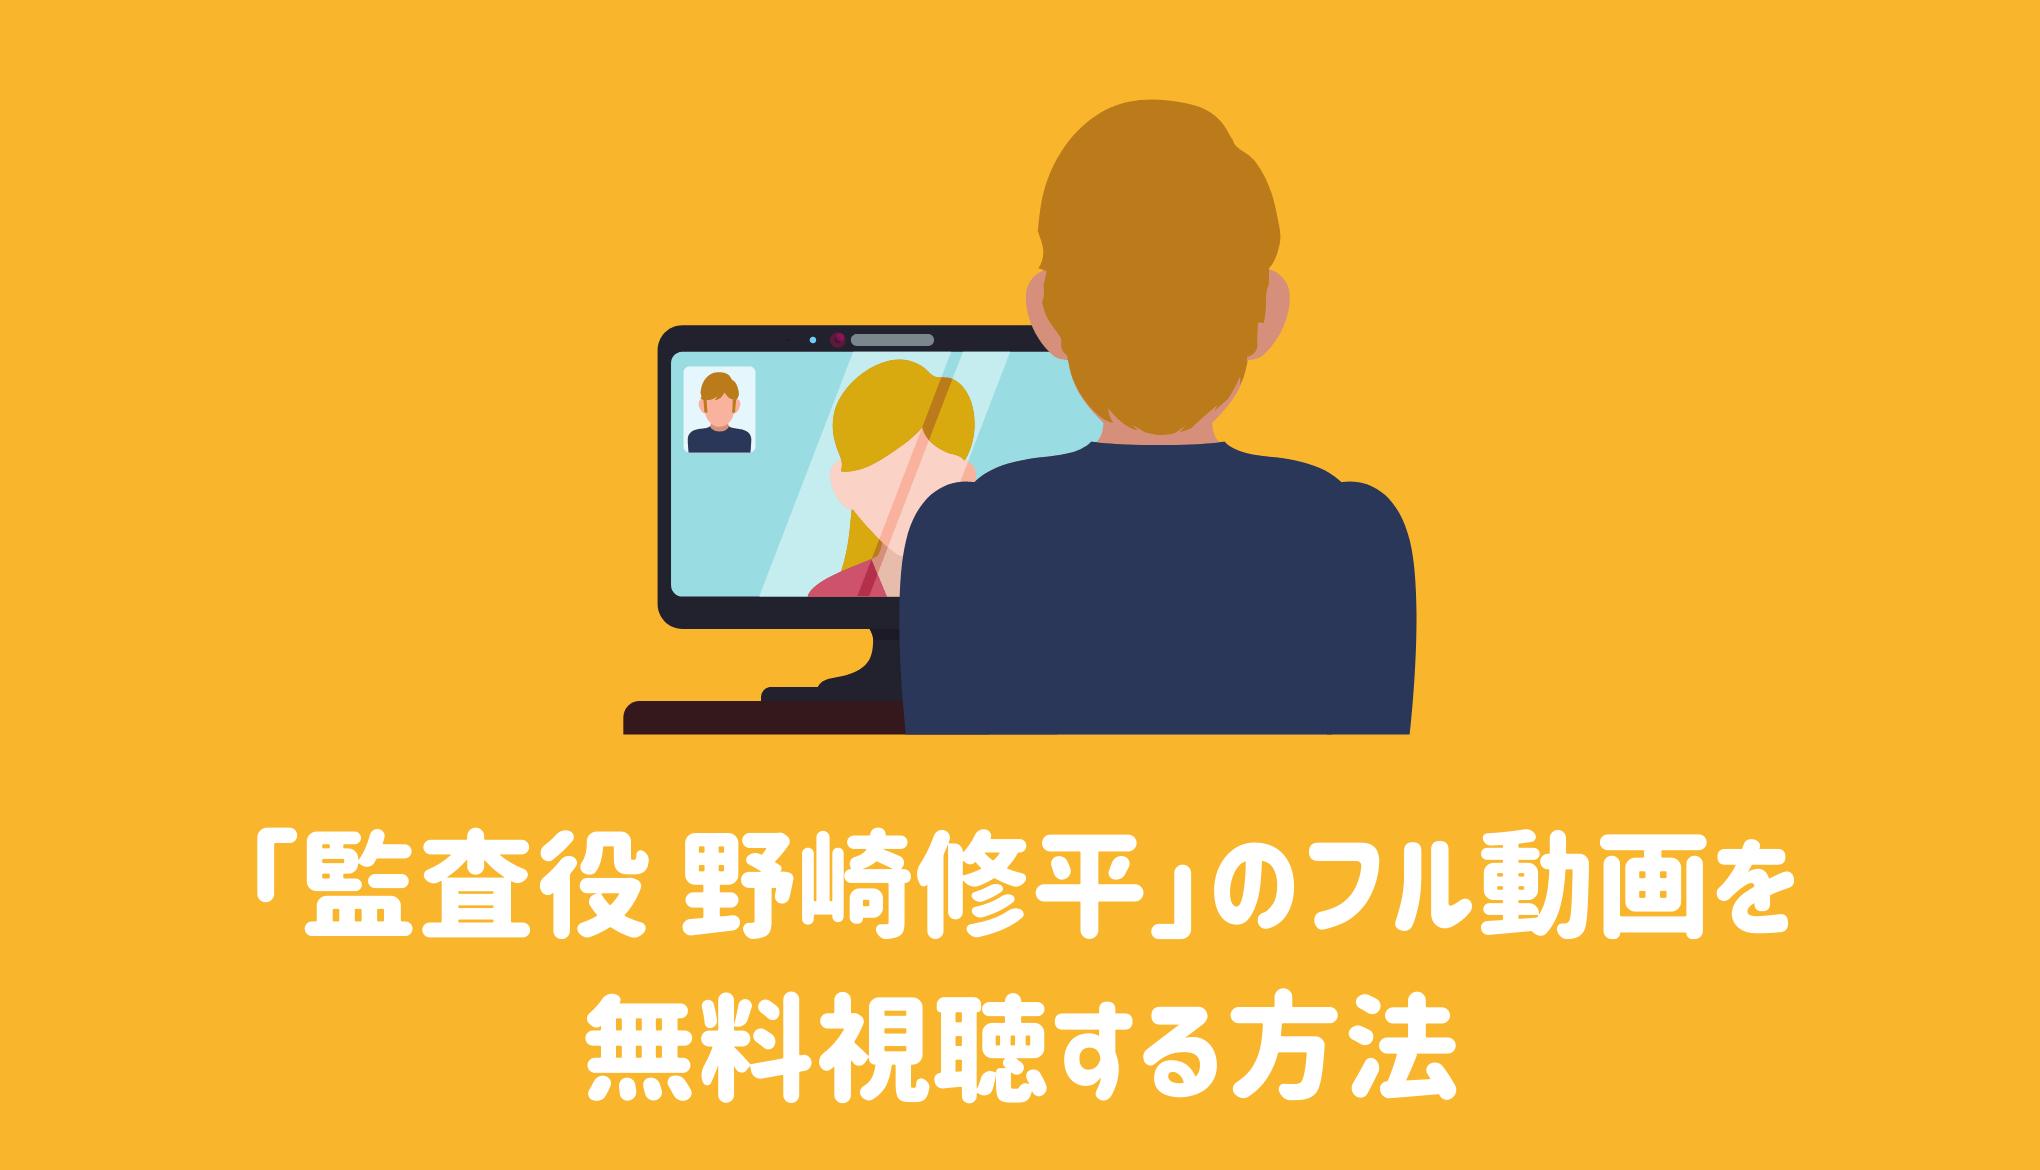 WOWOWオリジナルドラマ「監査役 野崎修平」を無料視聴する方法